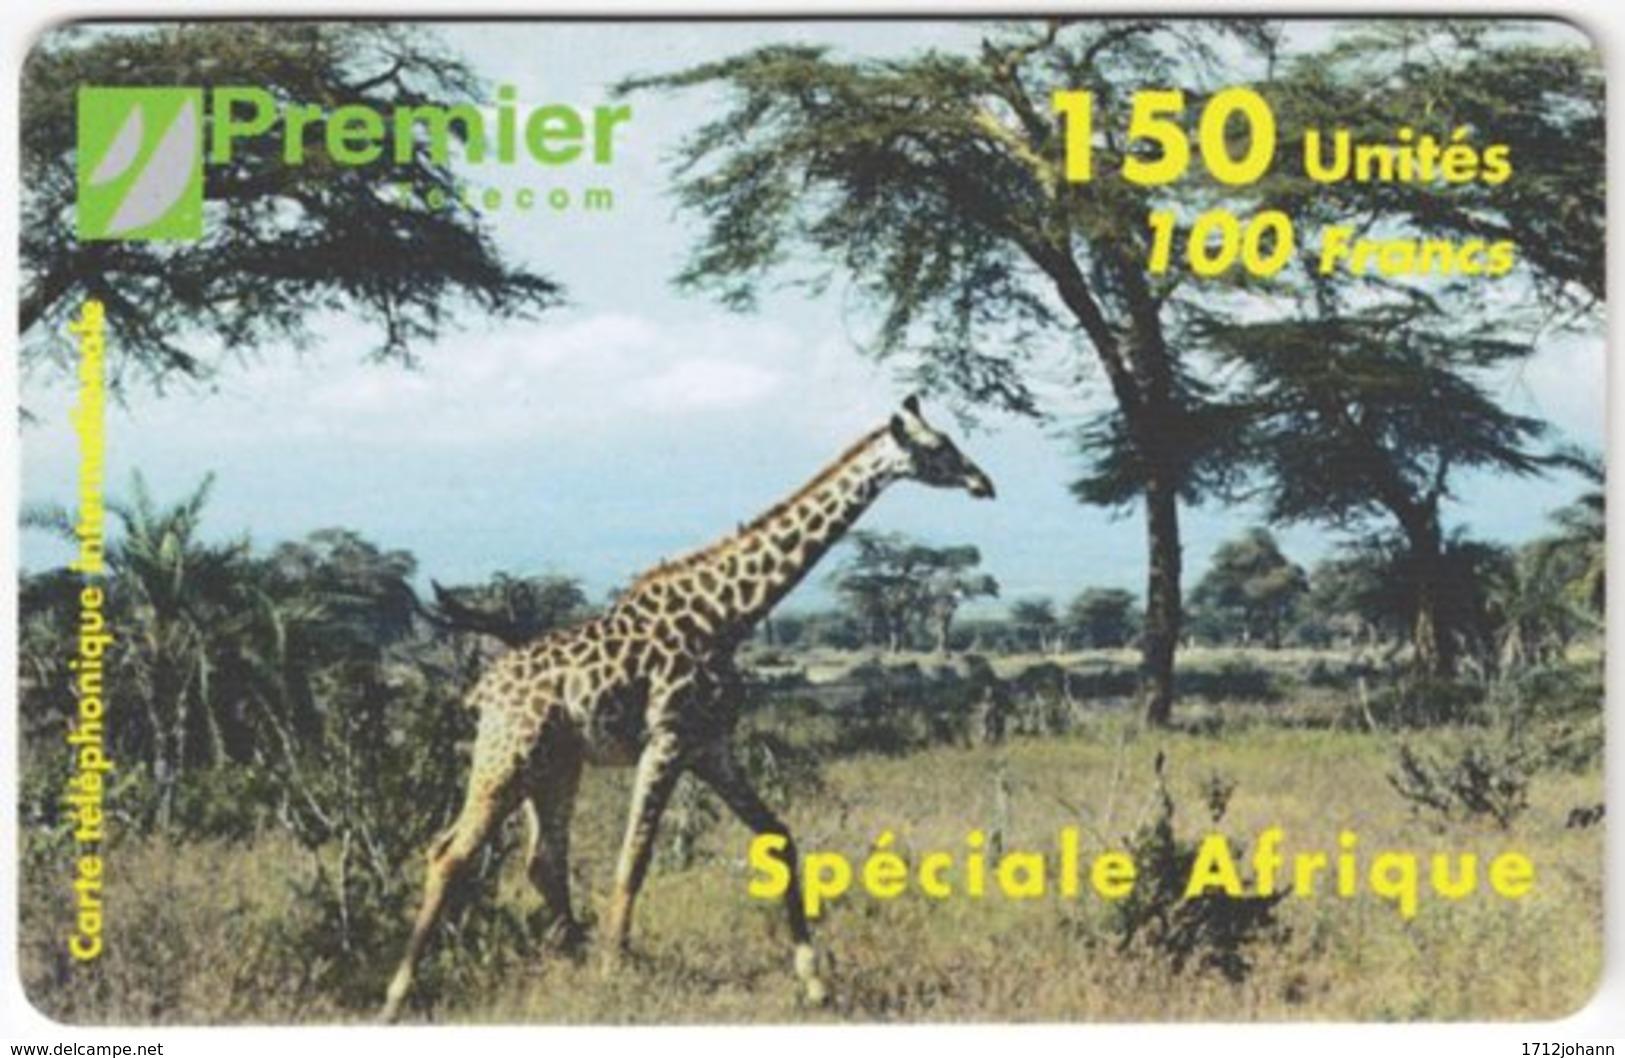 FRANCE C-471 Prepaid PremierTelecom - Animal, Giraffe - Used - Nachladekarten (Refill)